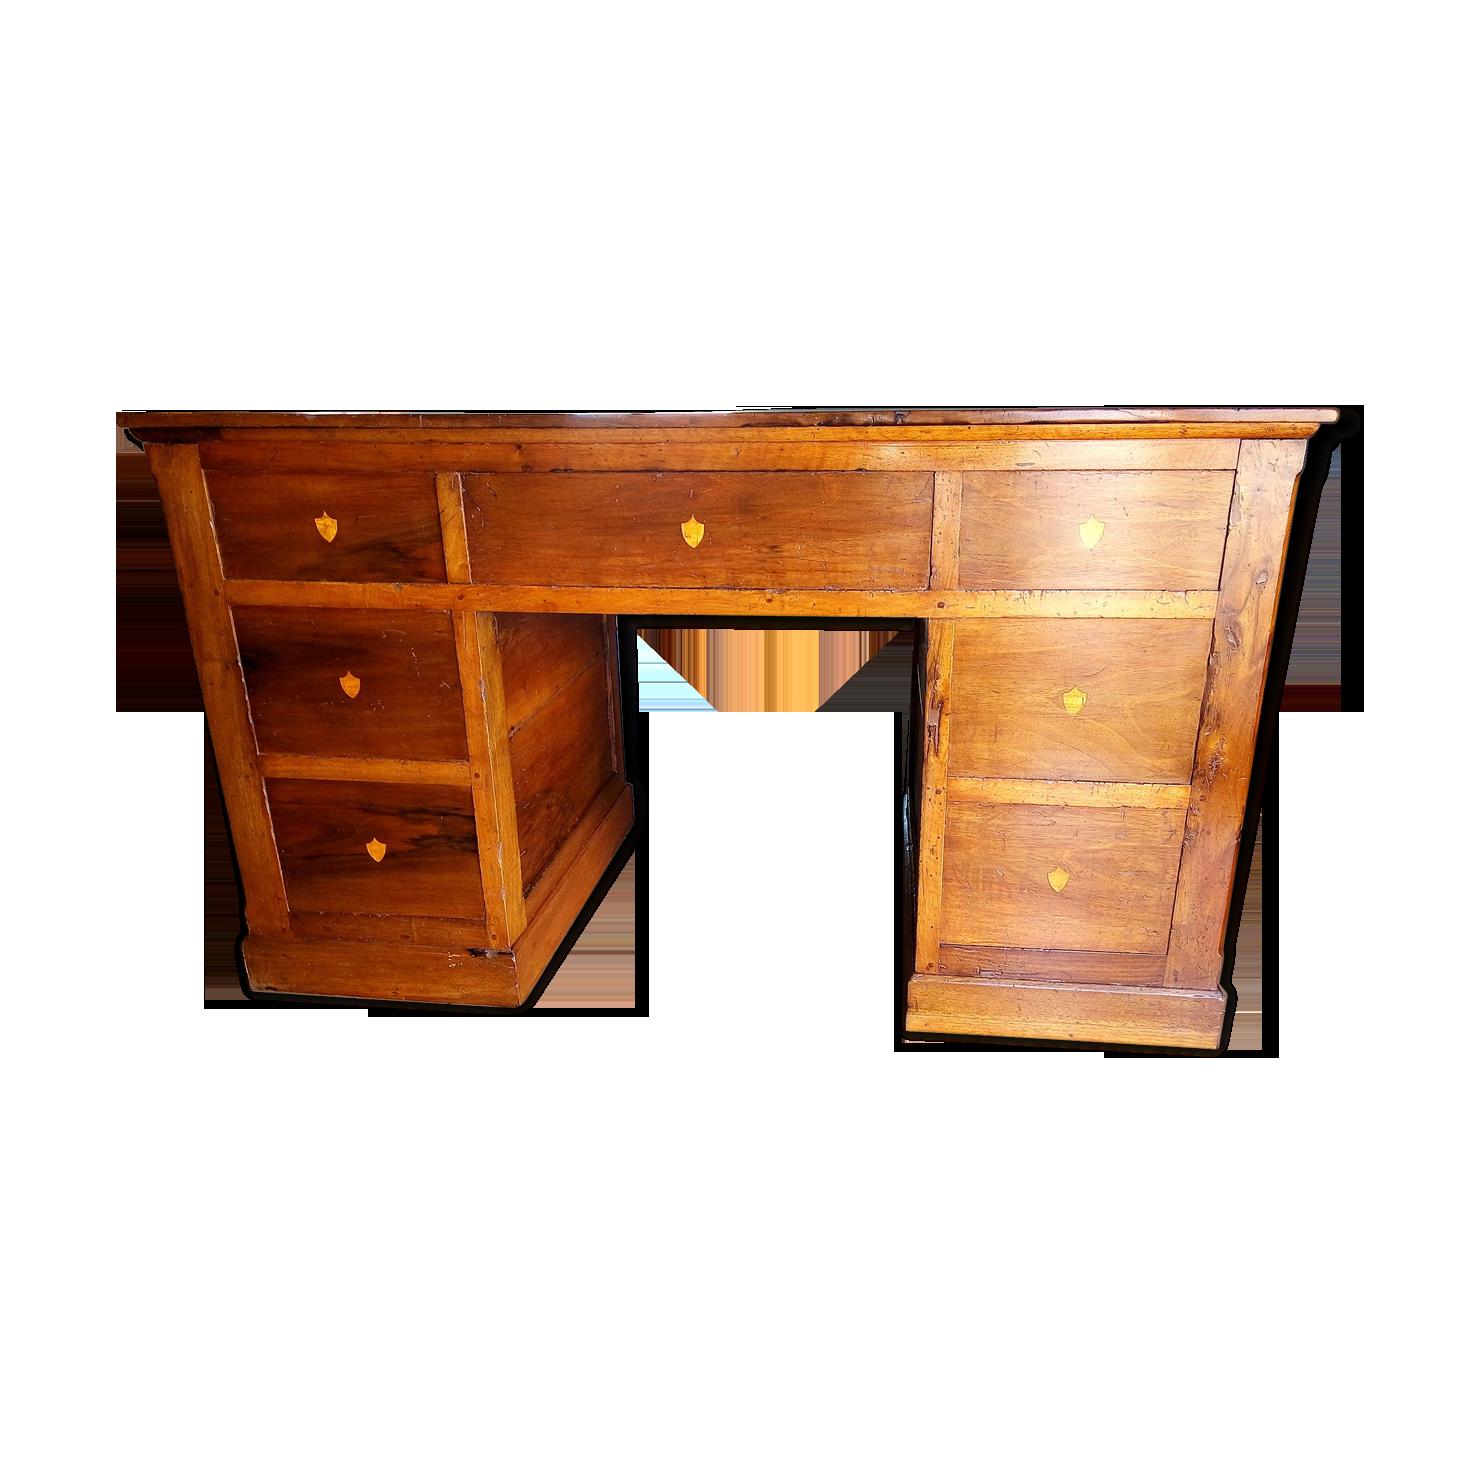 Table bureau en noyer massif xixe antiquites lecomte